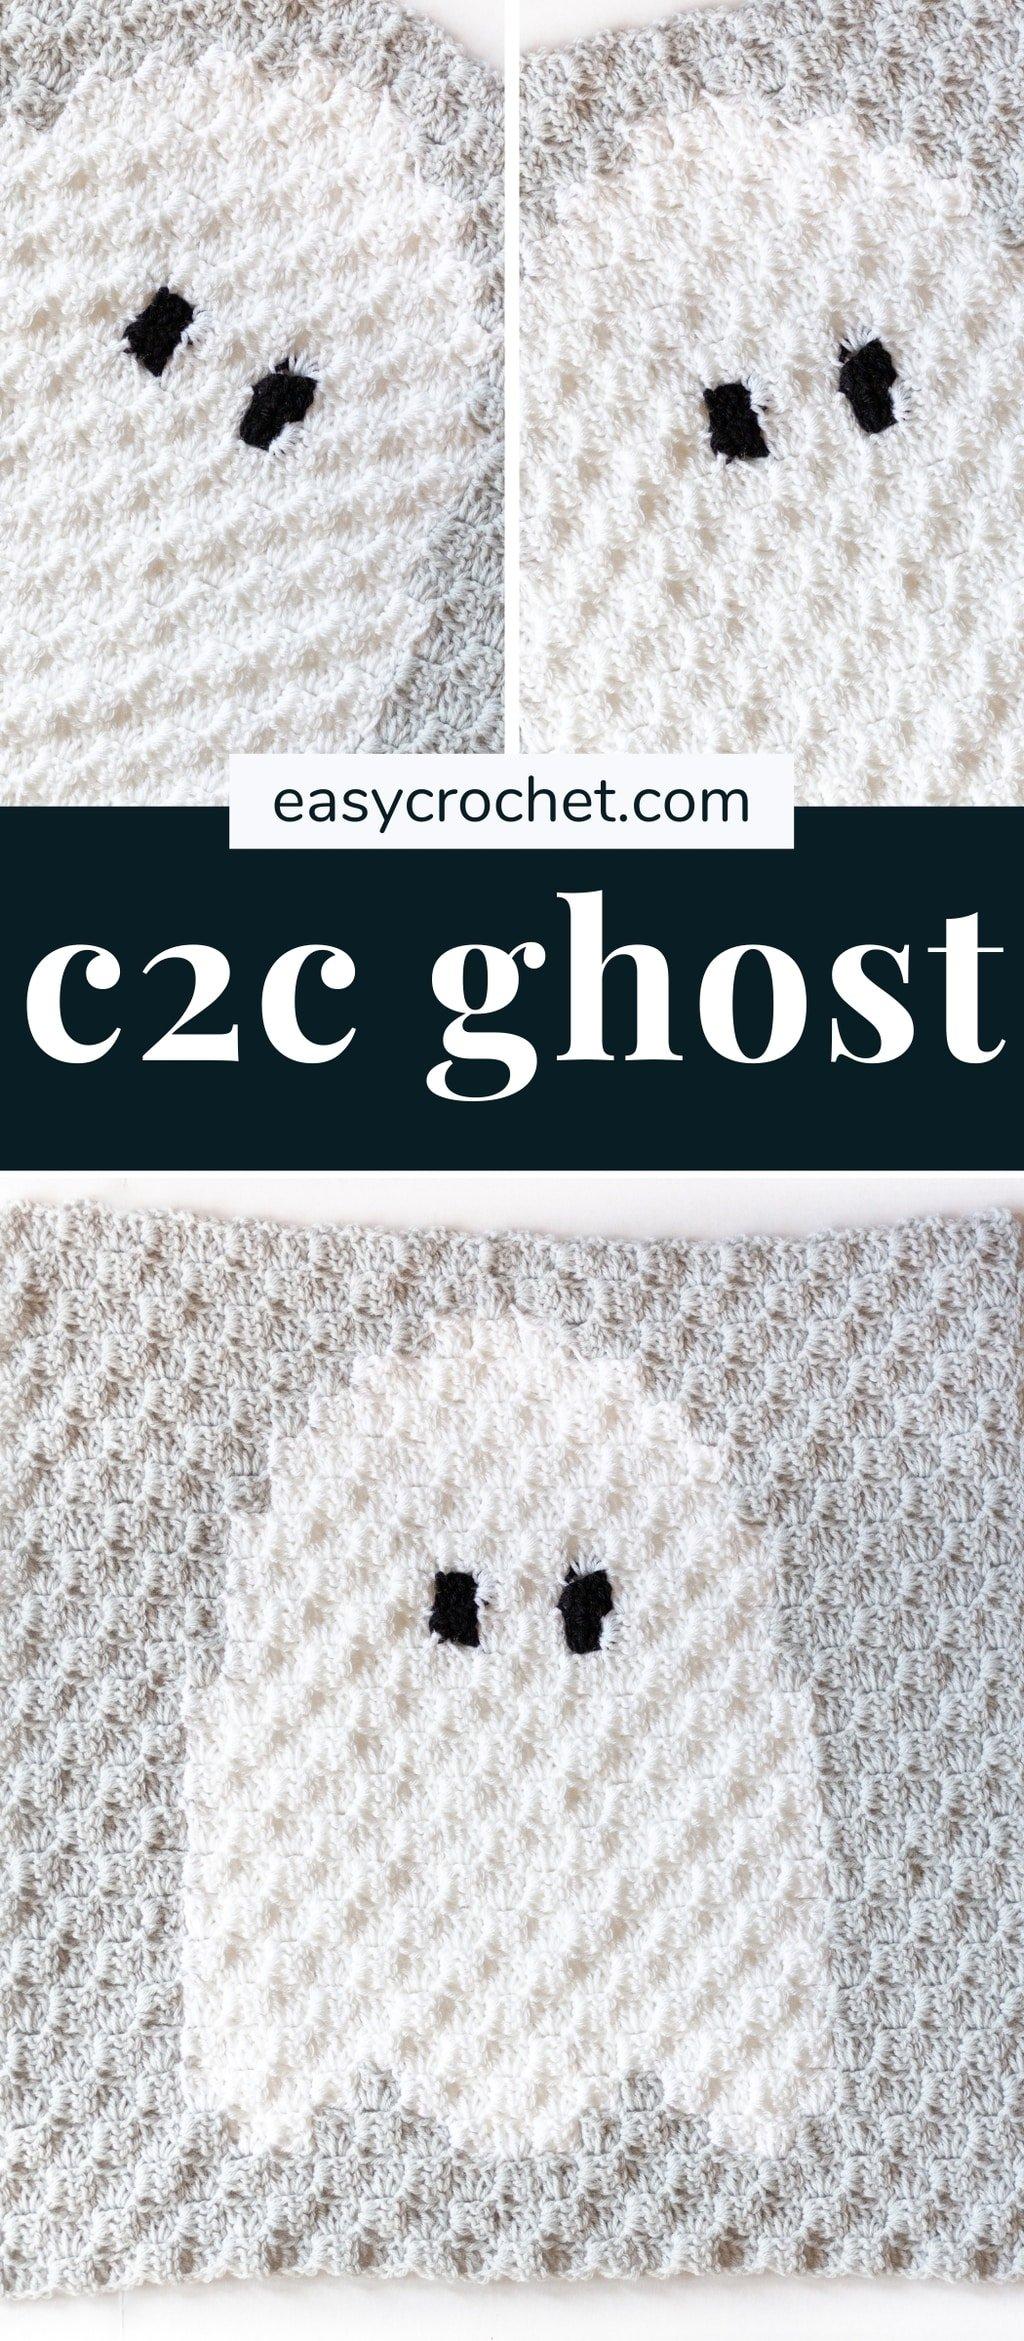 crochet halloween corner to corner (c2c) pattern